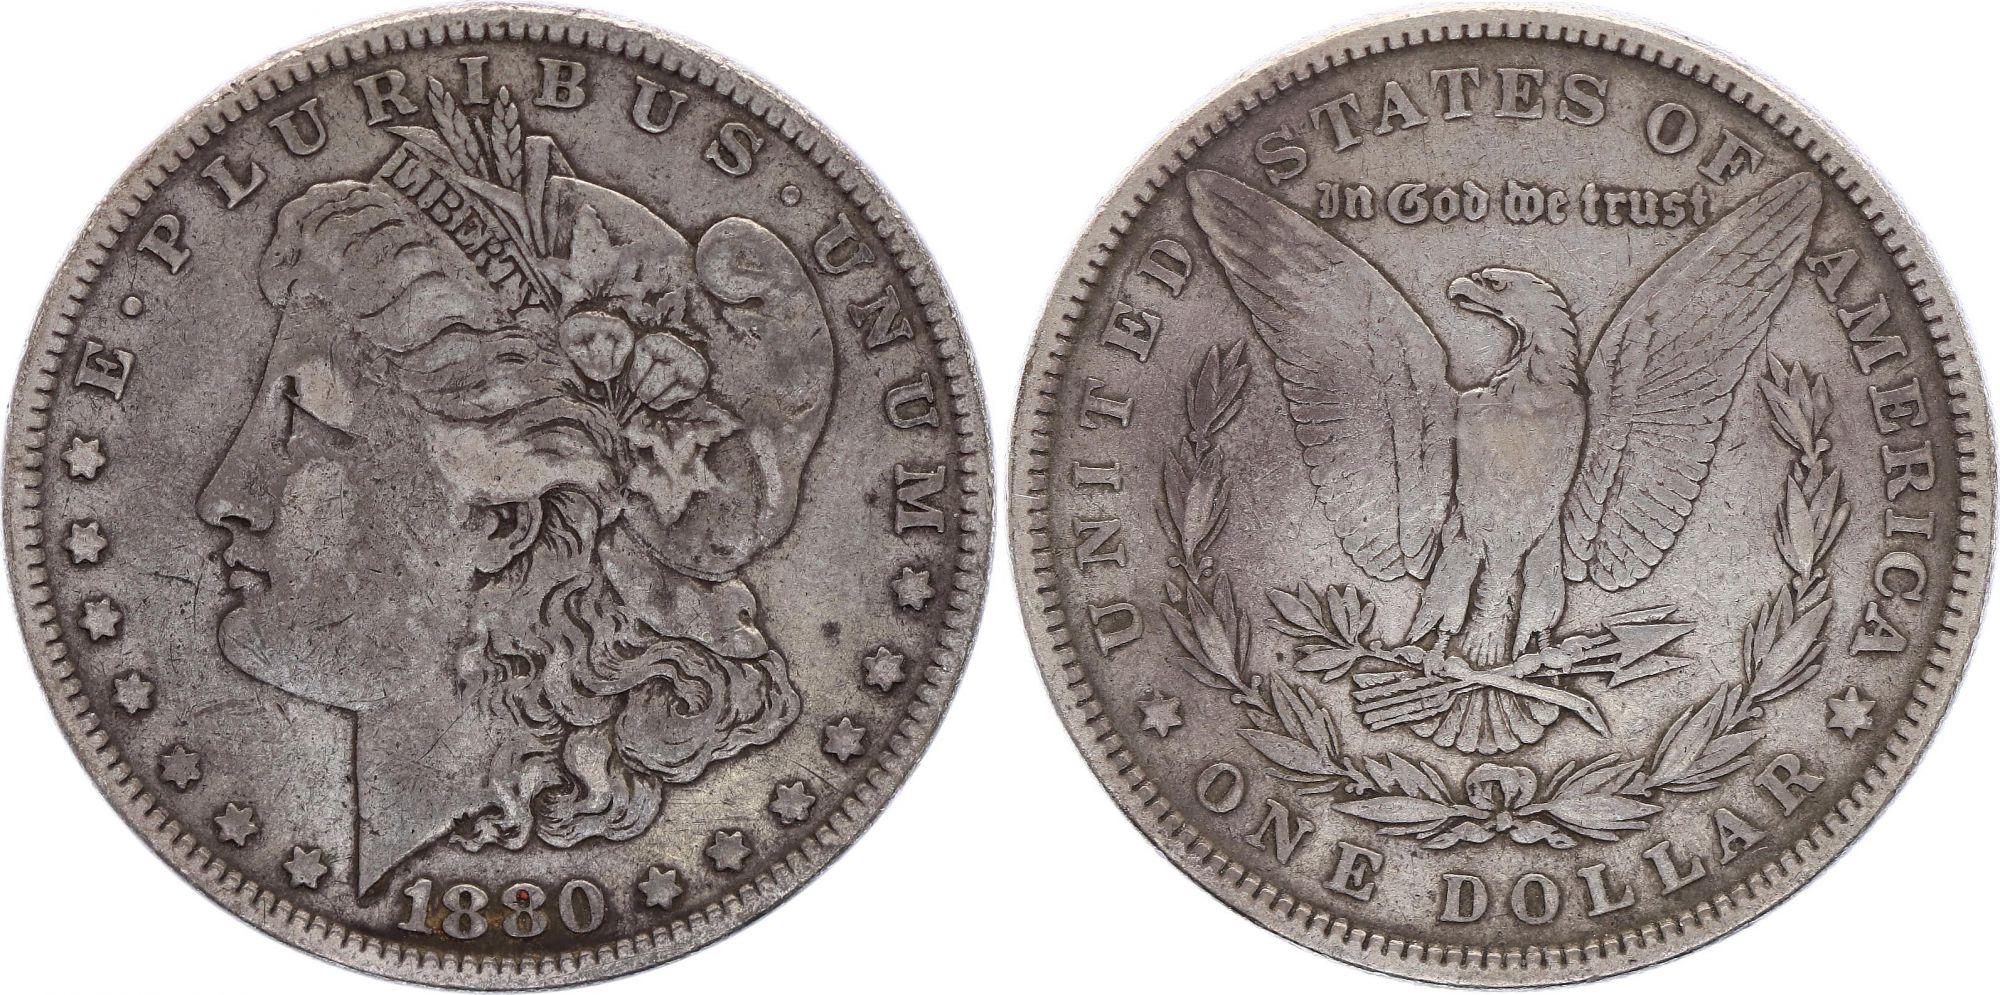 USA 1 Dollar Morgan - Aigle 1880 - Argent sans atelier - TB - 2nd ex